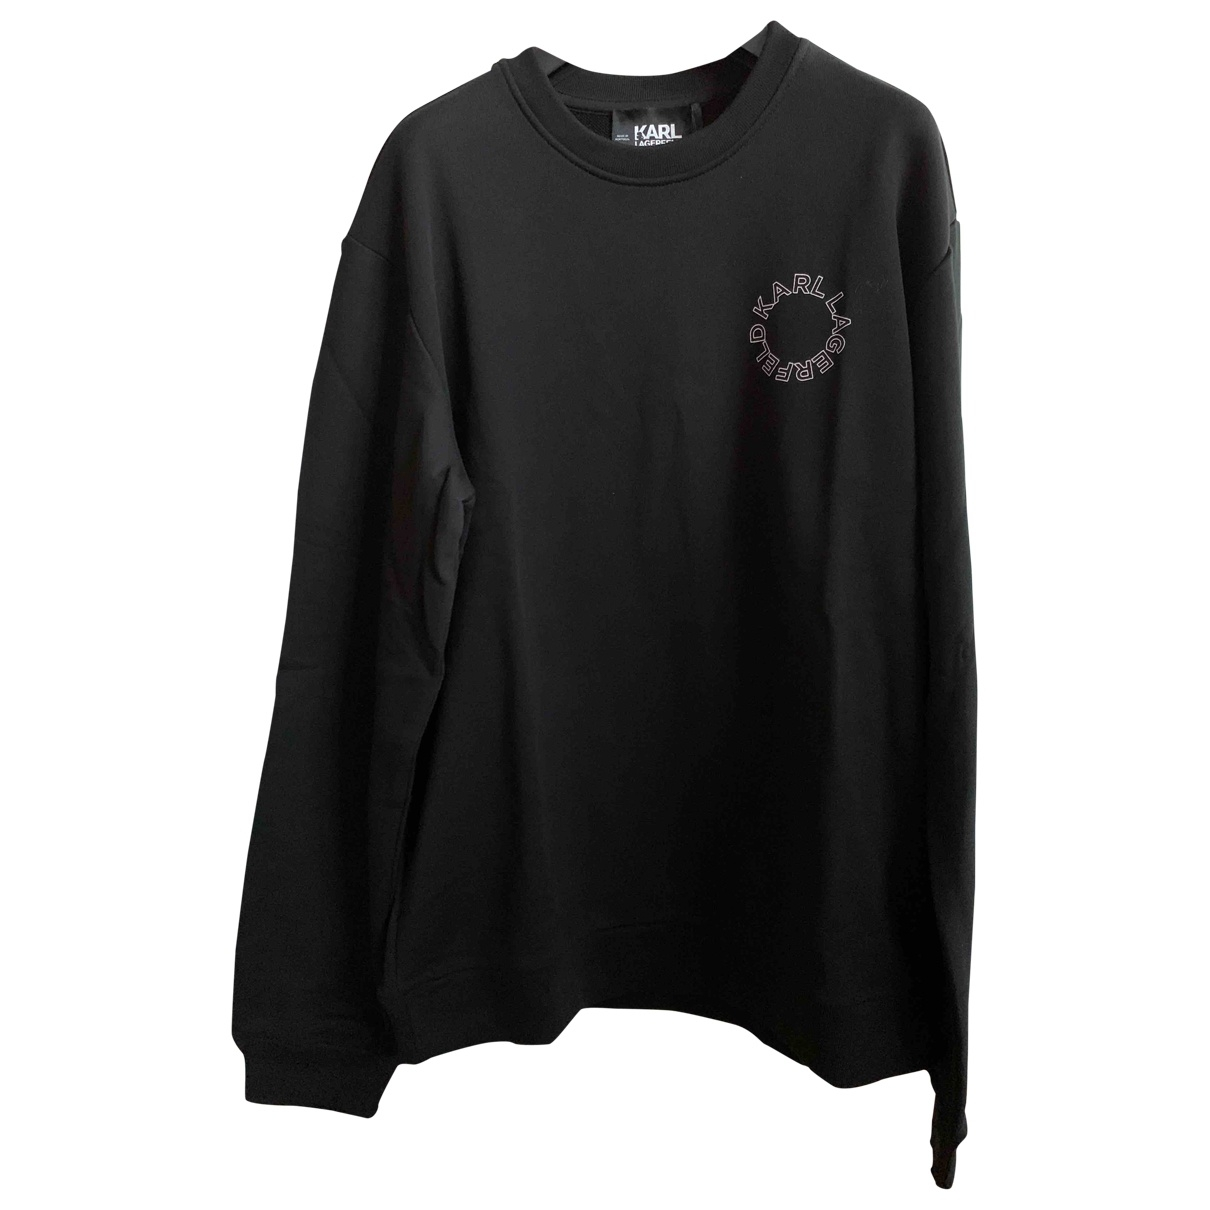 Karl Lagerfeld \N Black Cotton Knitwear & Sweatshirts for Men M International